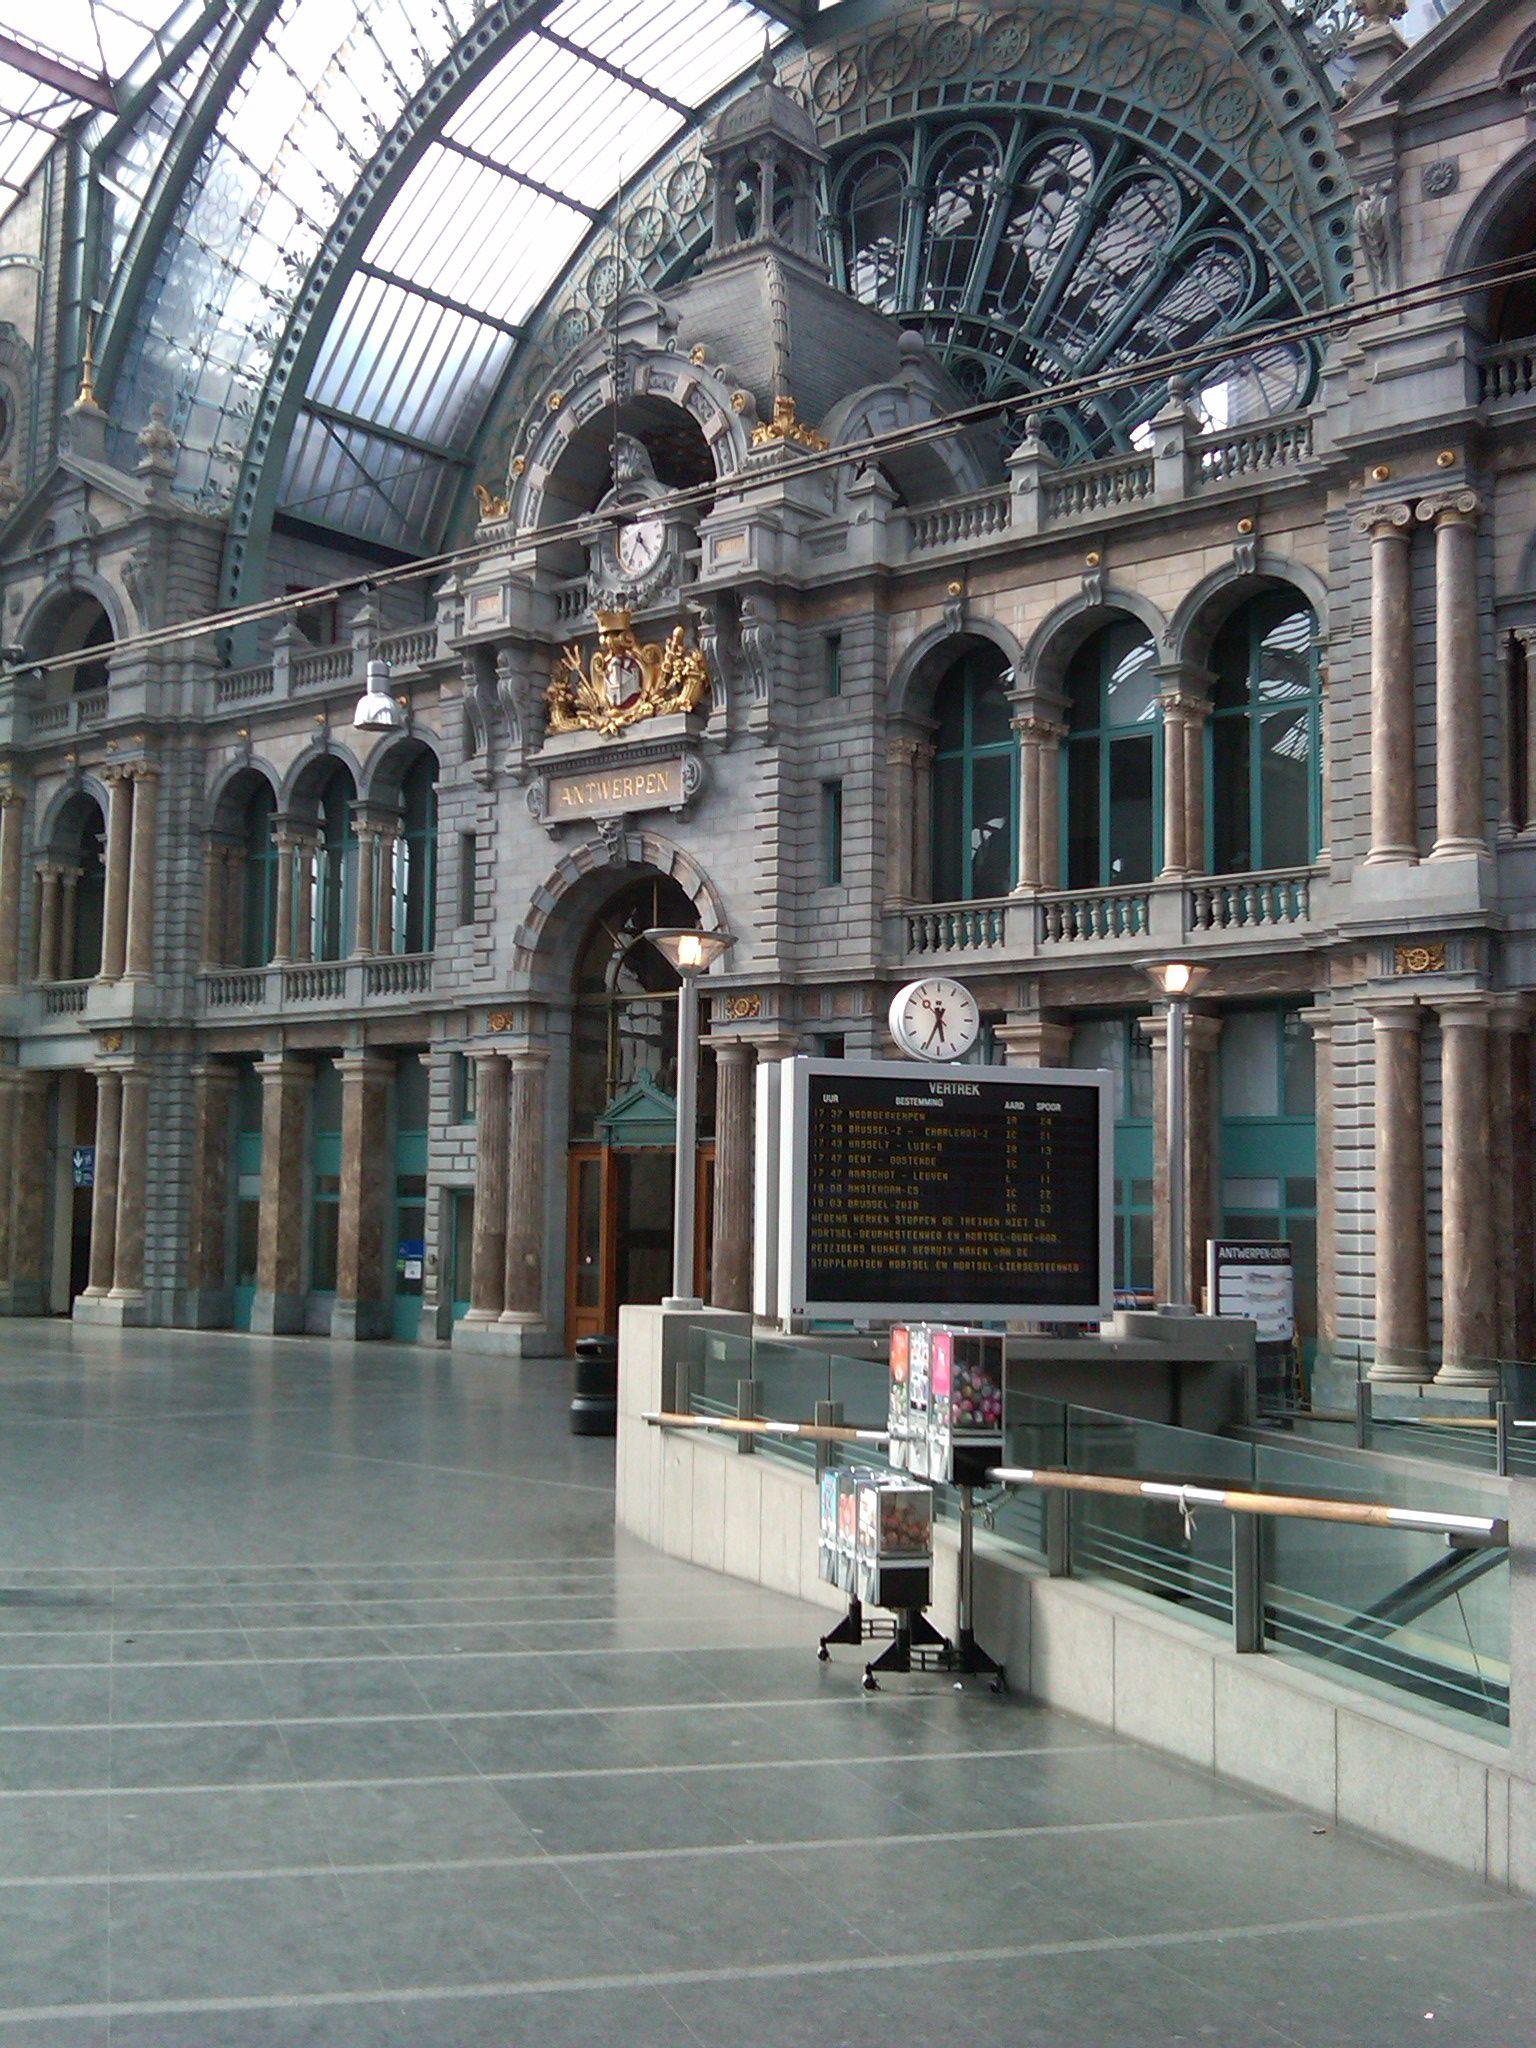 Antwerpen Central Train Station.  Antwerpen, Belgium